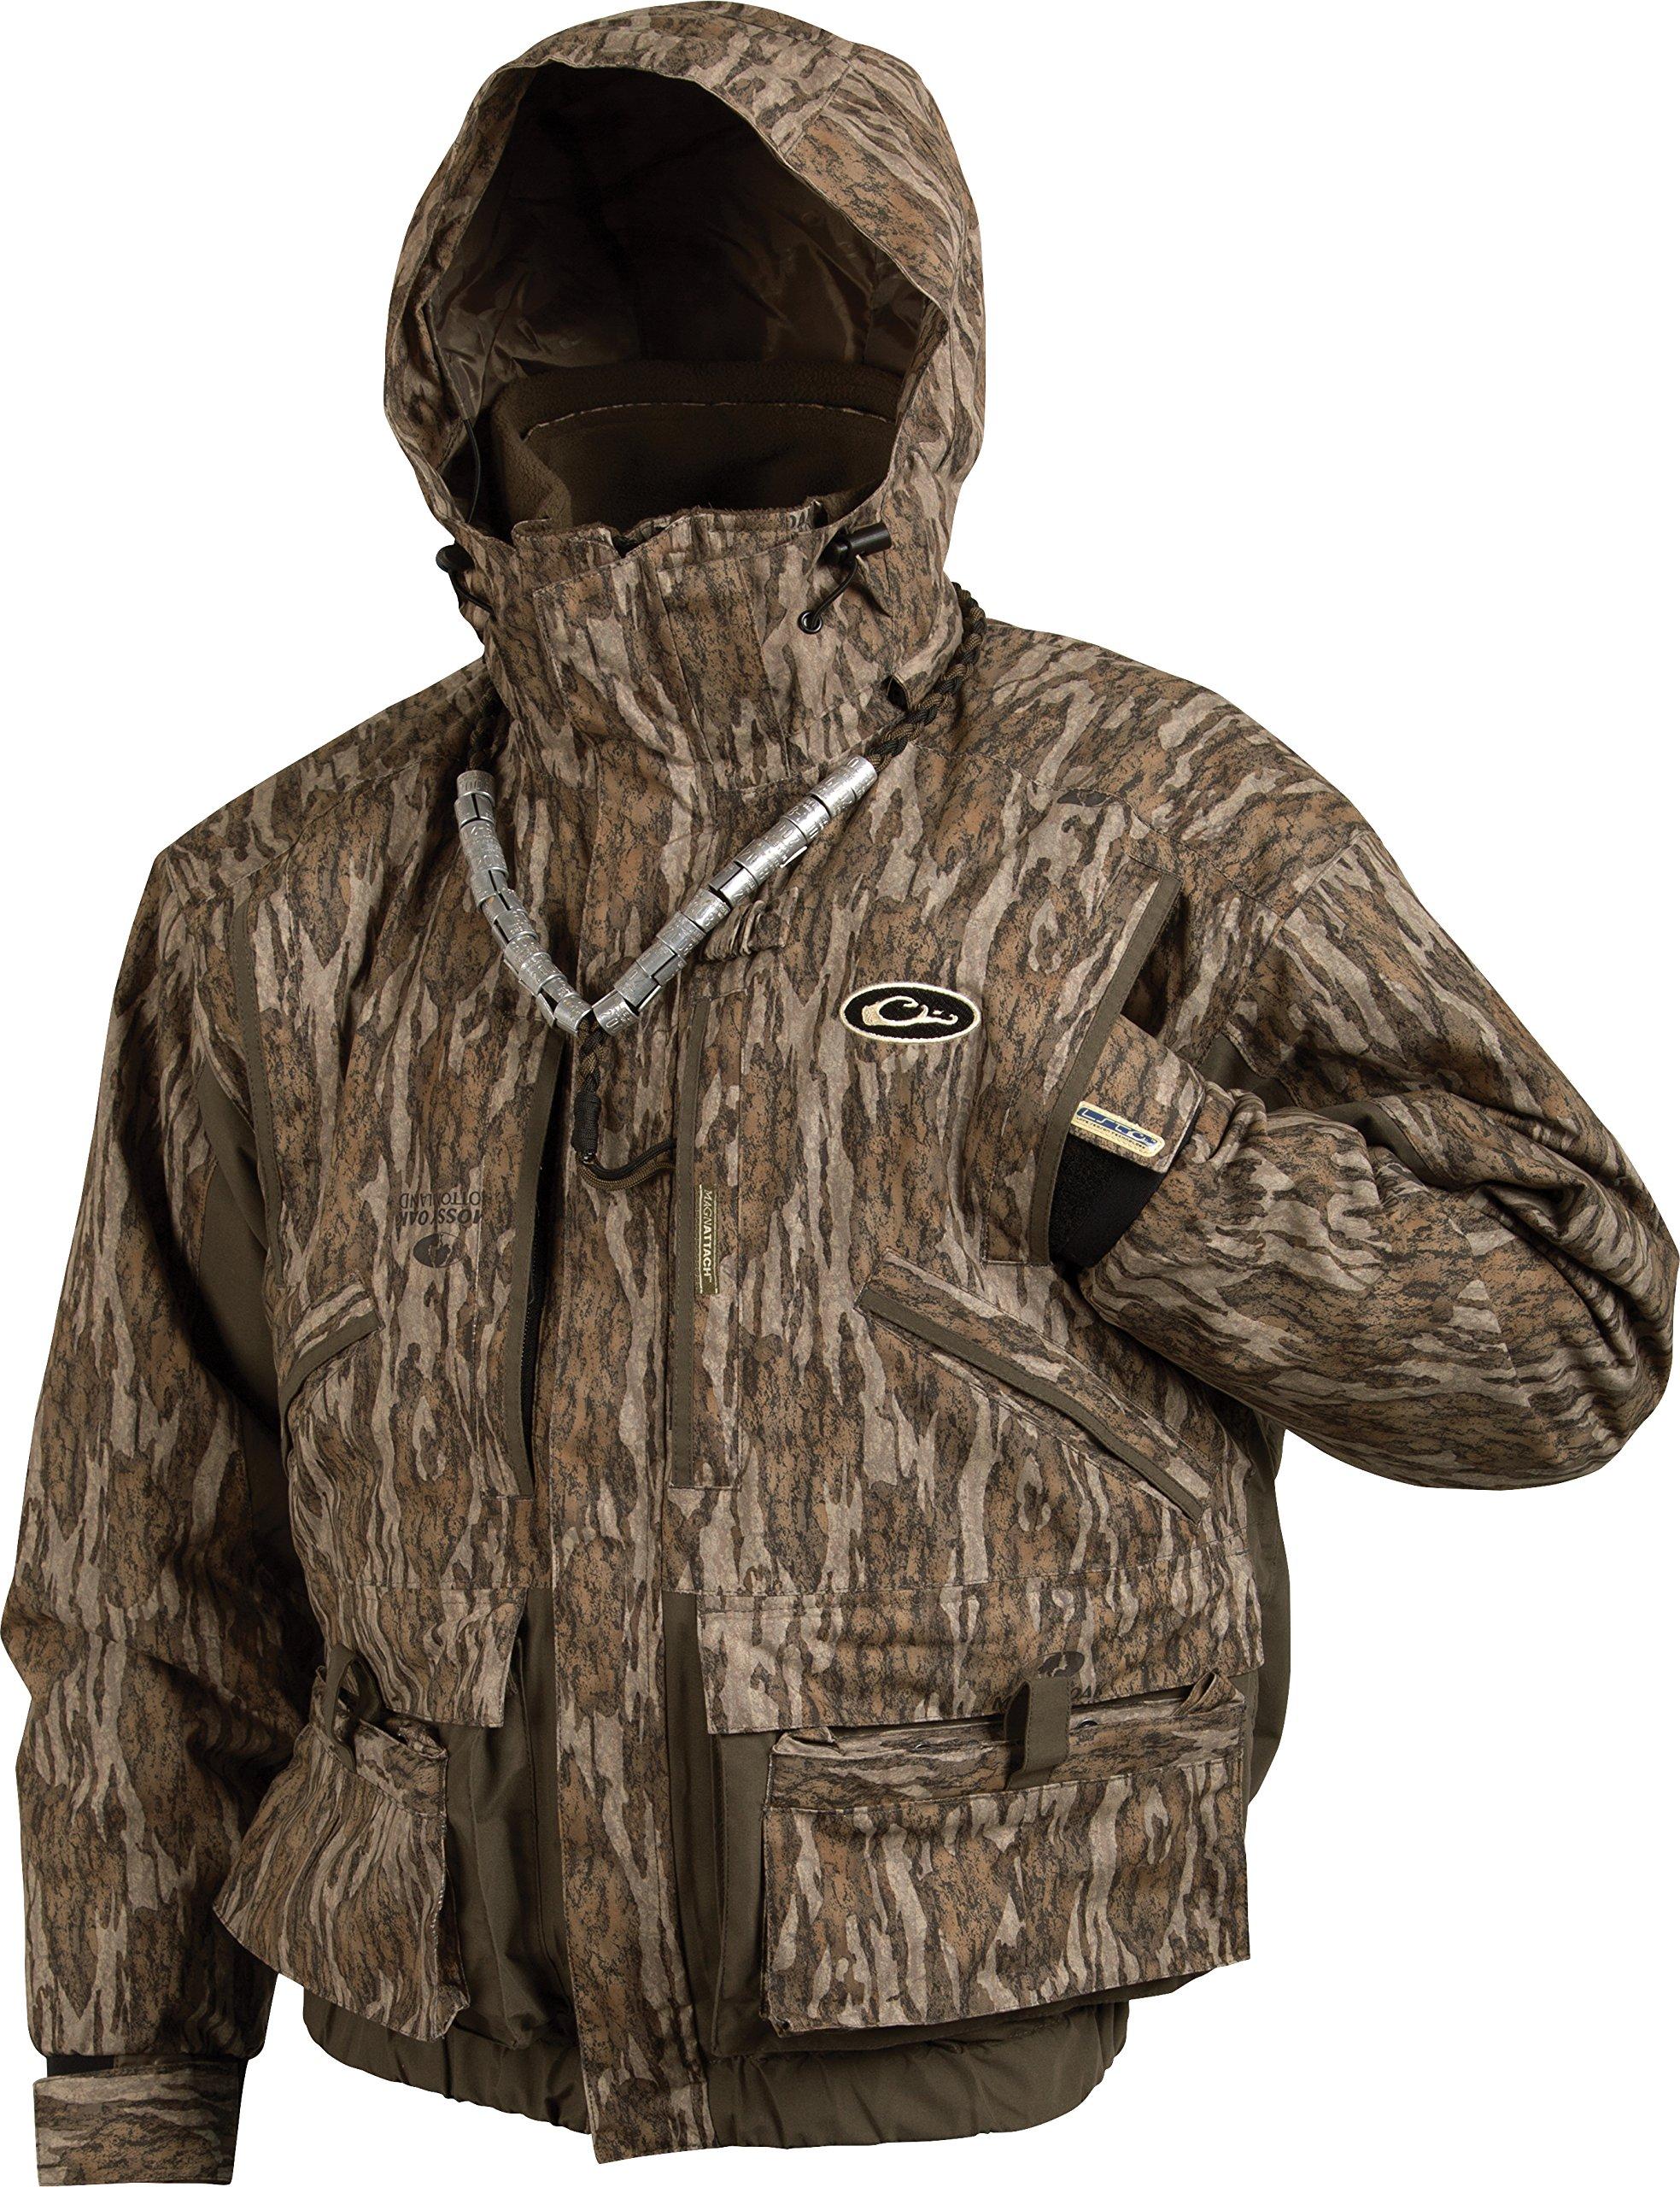 Drake Boy's LST Eqwader 3-in-1 Plus 2 Wader Coat 2.0 (Large, Mossy Oak Bottomland)